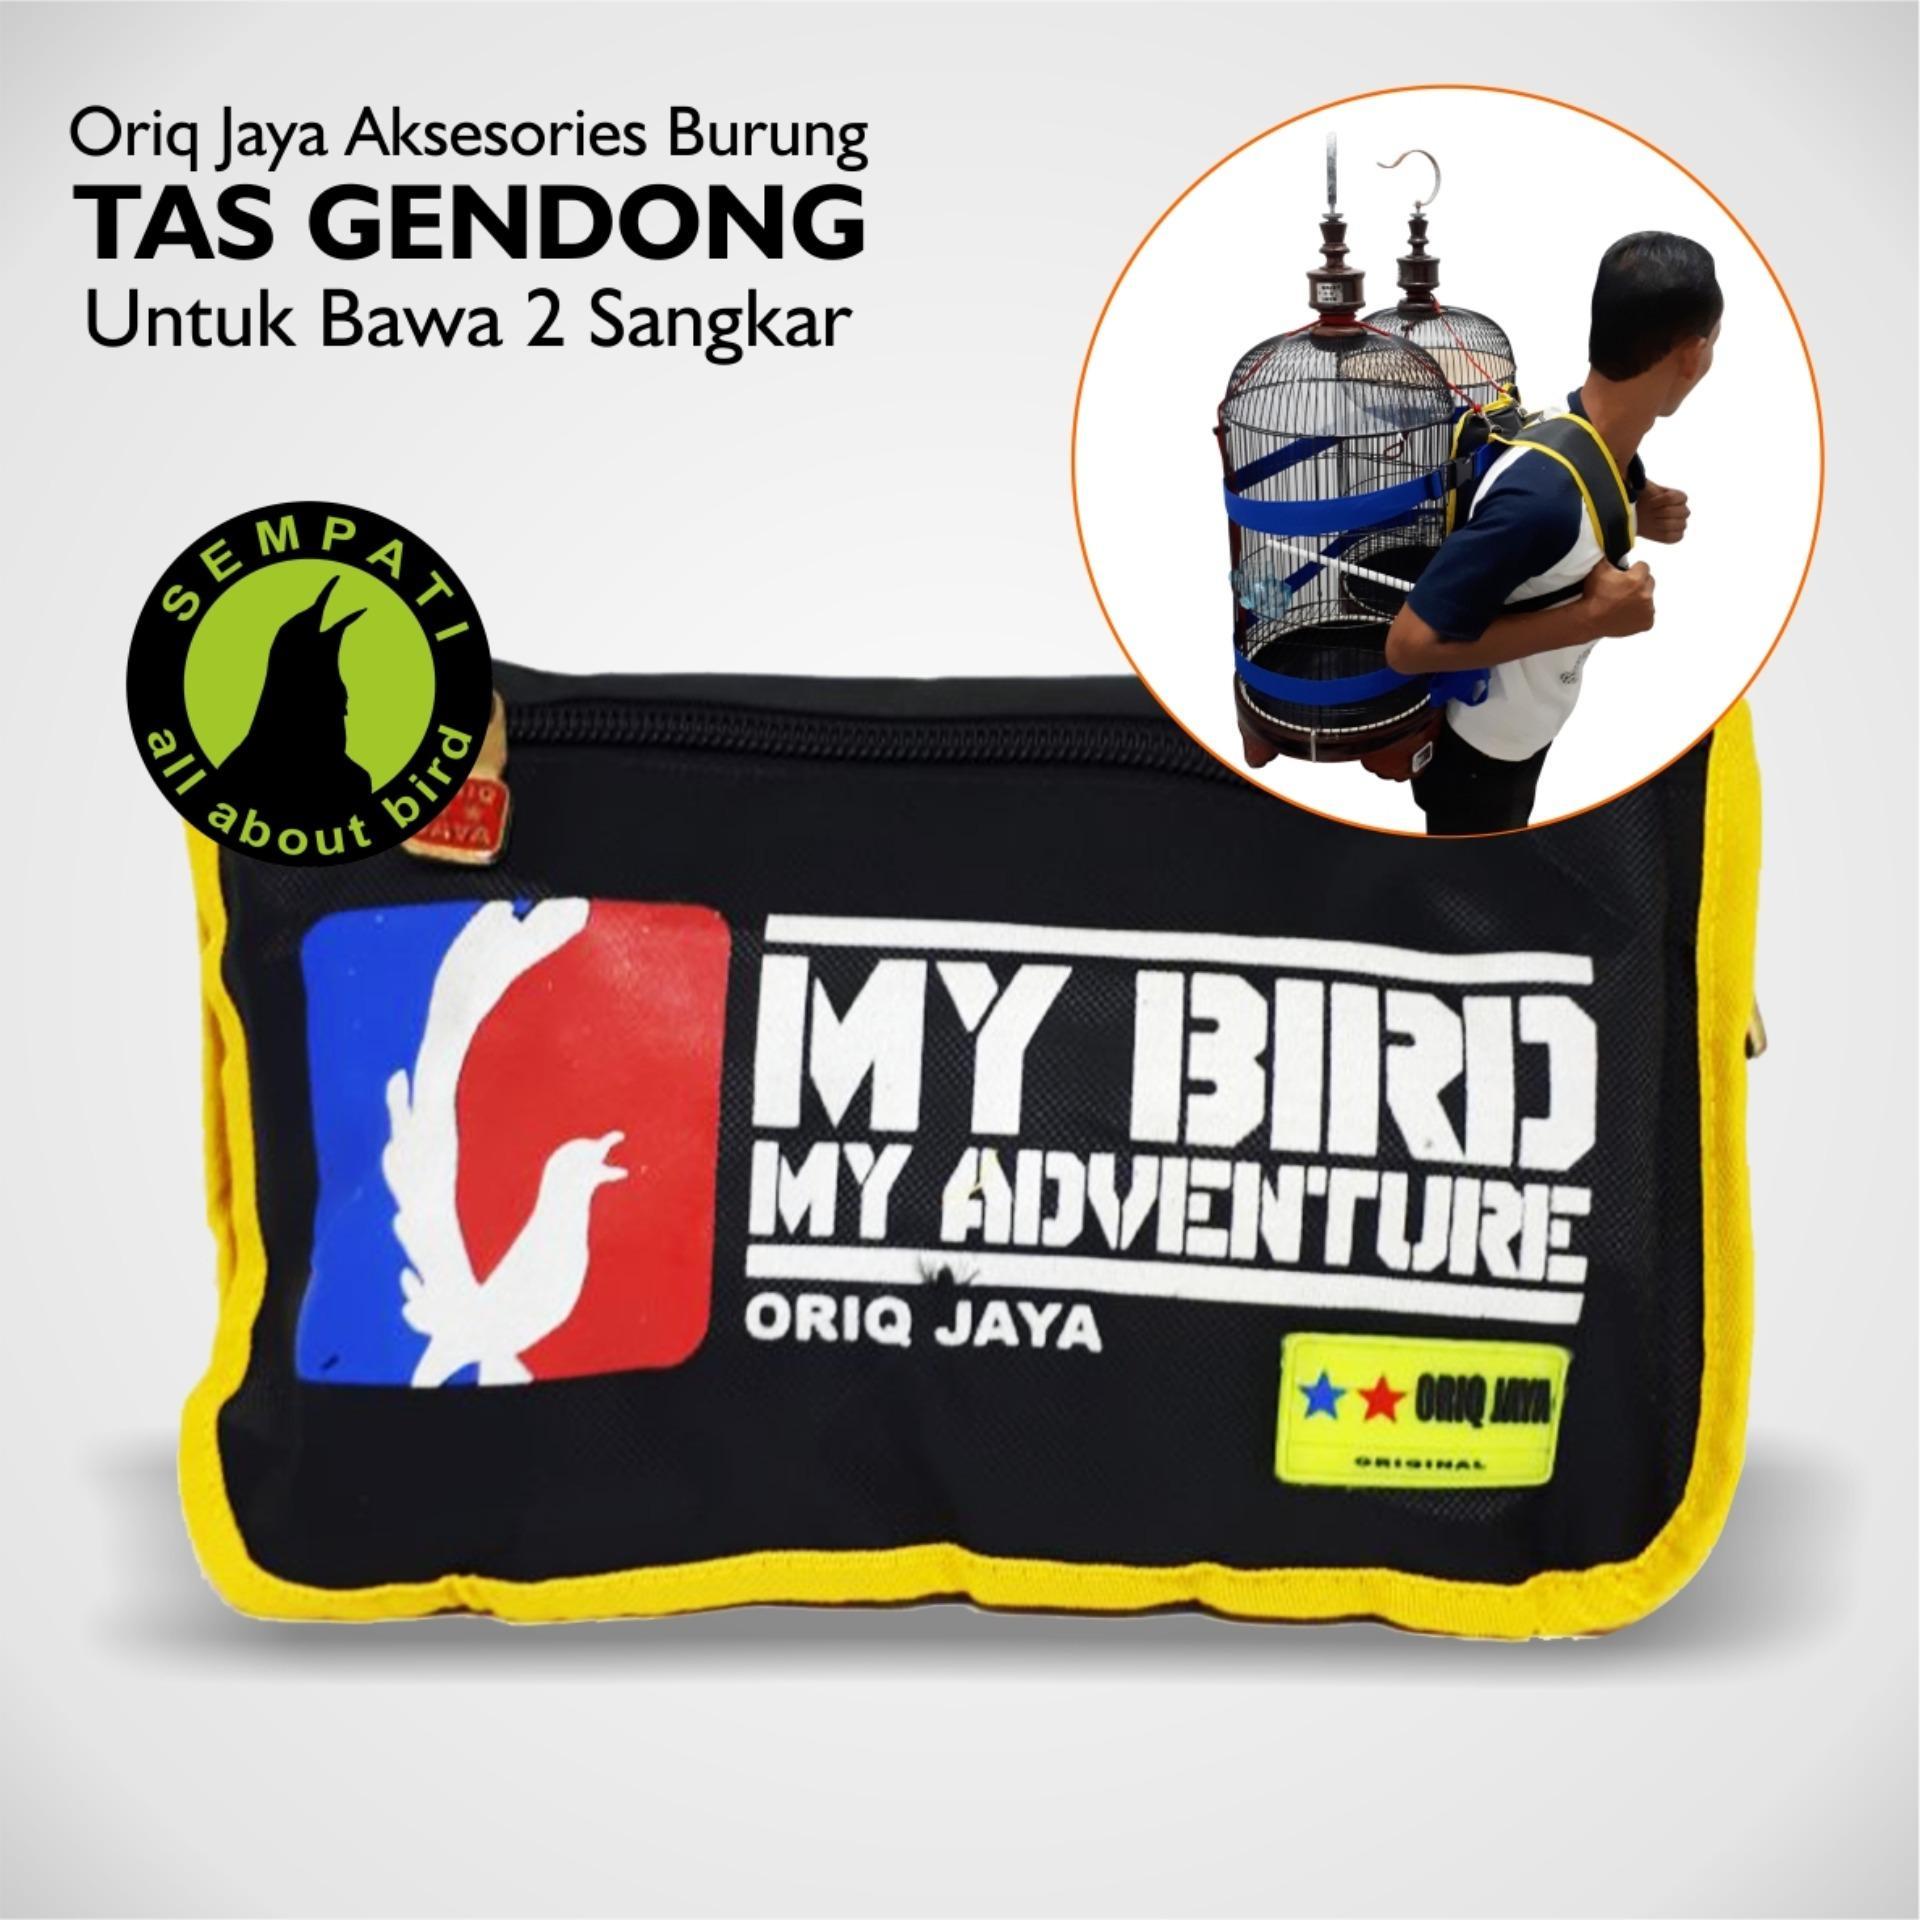 KRODONG SANGKAR BURUNG KAOS LOMBA LOVEBIRD POLOS ORIQ JAYA. Source · Tas Punggung Untuk Bawa Dua Sangkar Burung Oriq Jaya